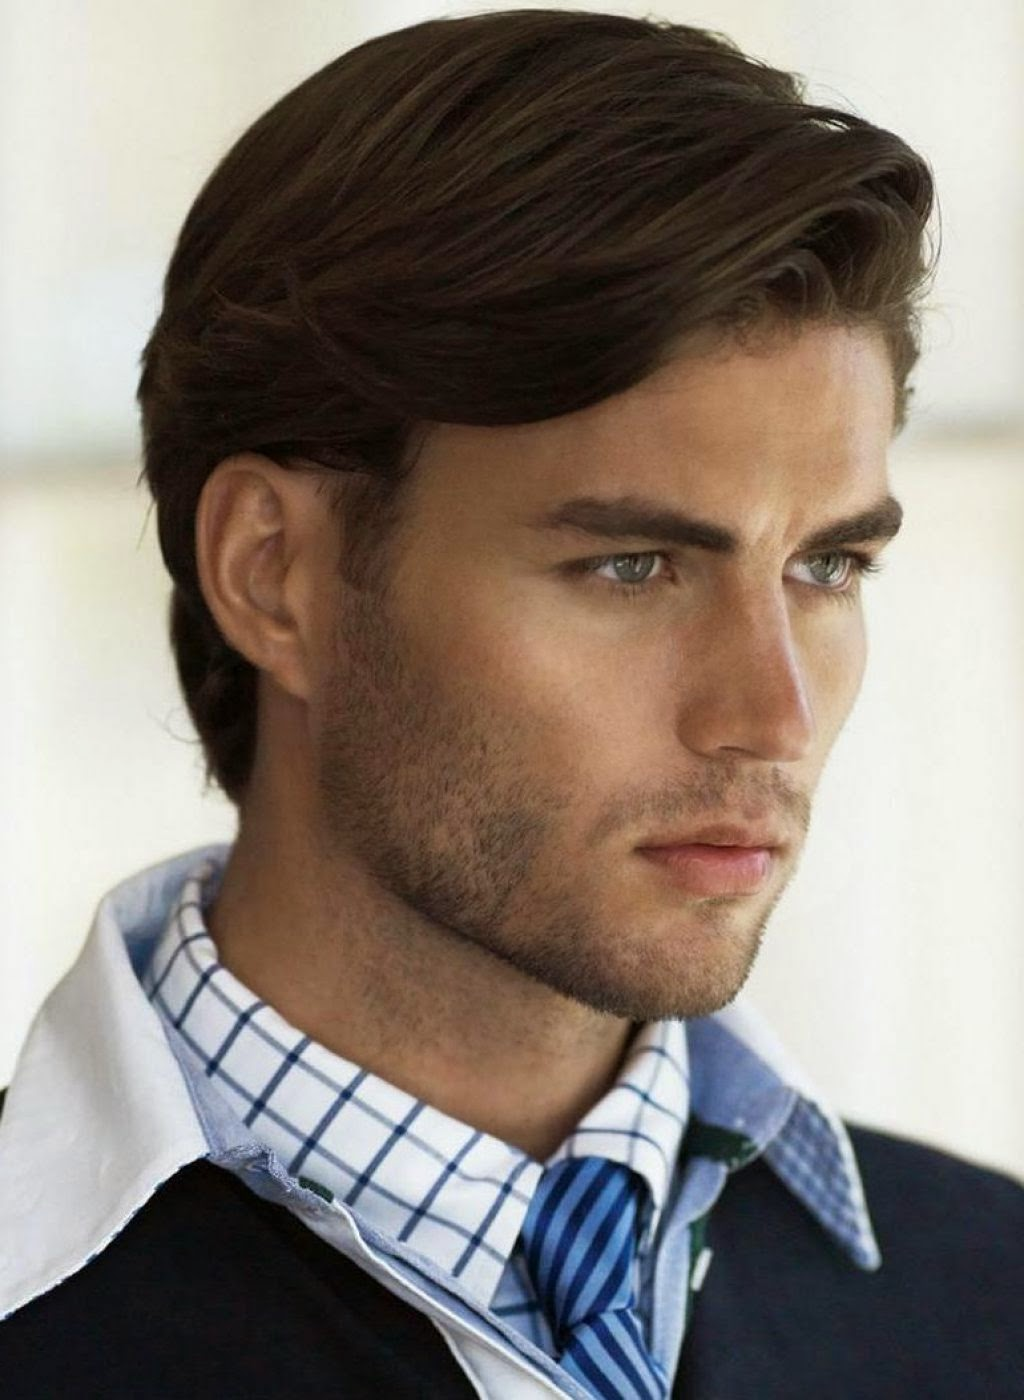 Peinados Formales Para Hombres Elainacortez